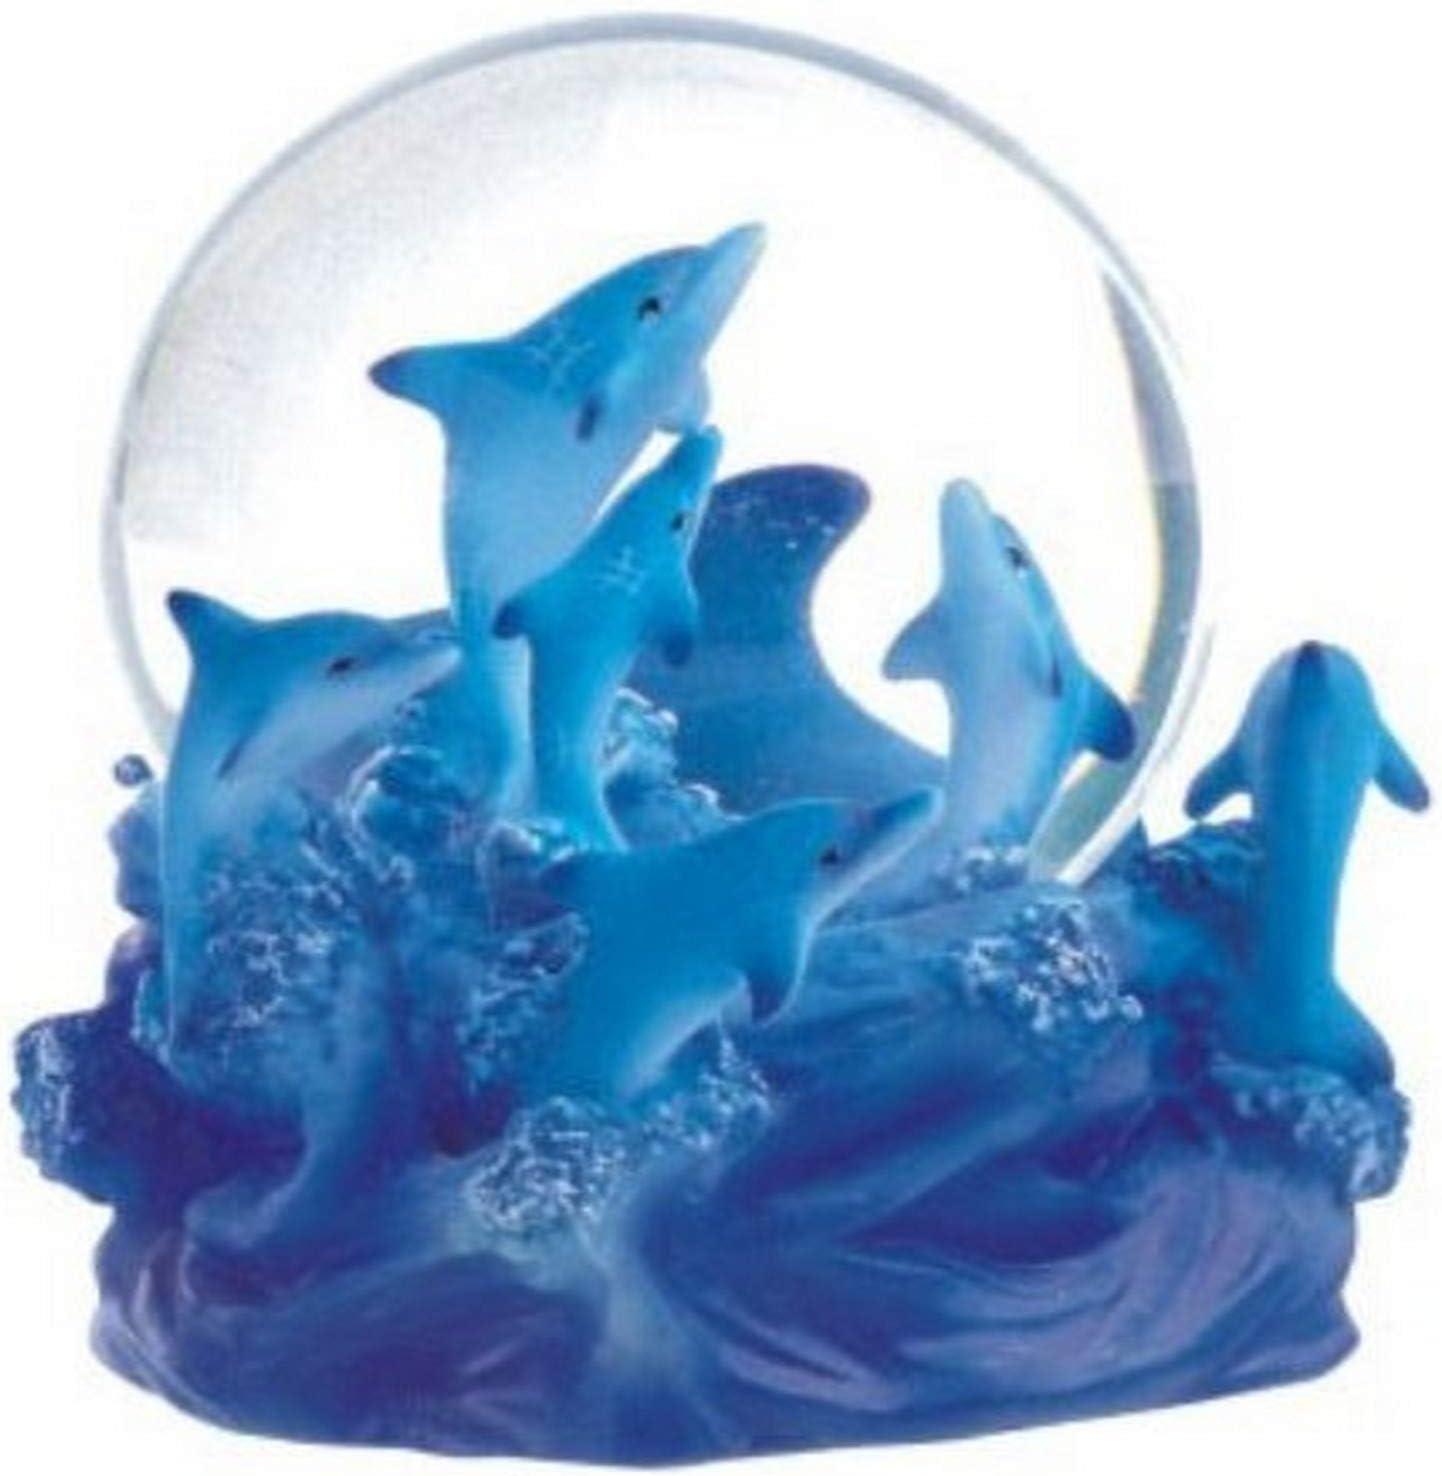 George S. Chen Imports Snow Globe Dolphin Collection Desk Figurine